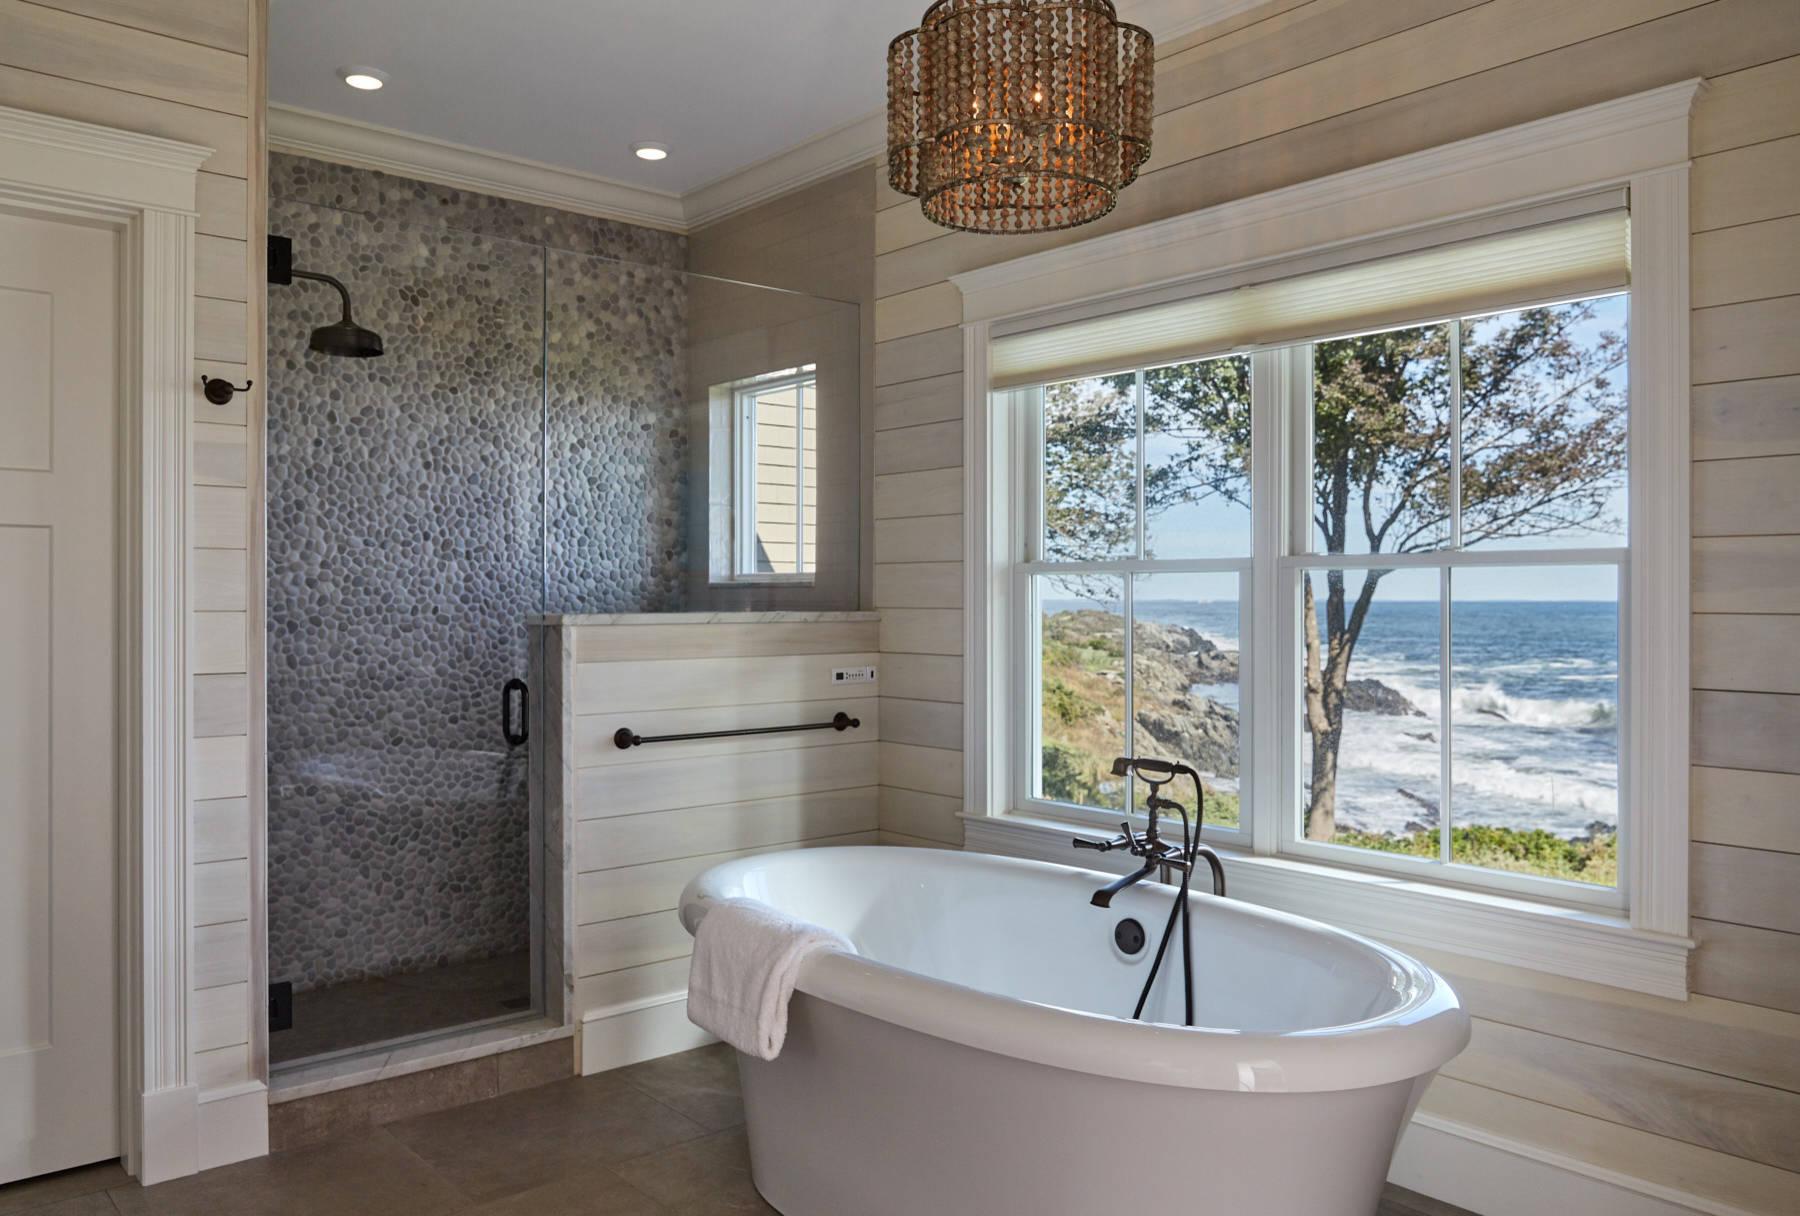 Pebble Tile Bathroom Pictures Ideas, Bathroom With Pebble Tiles